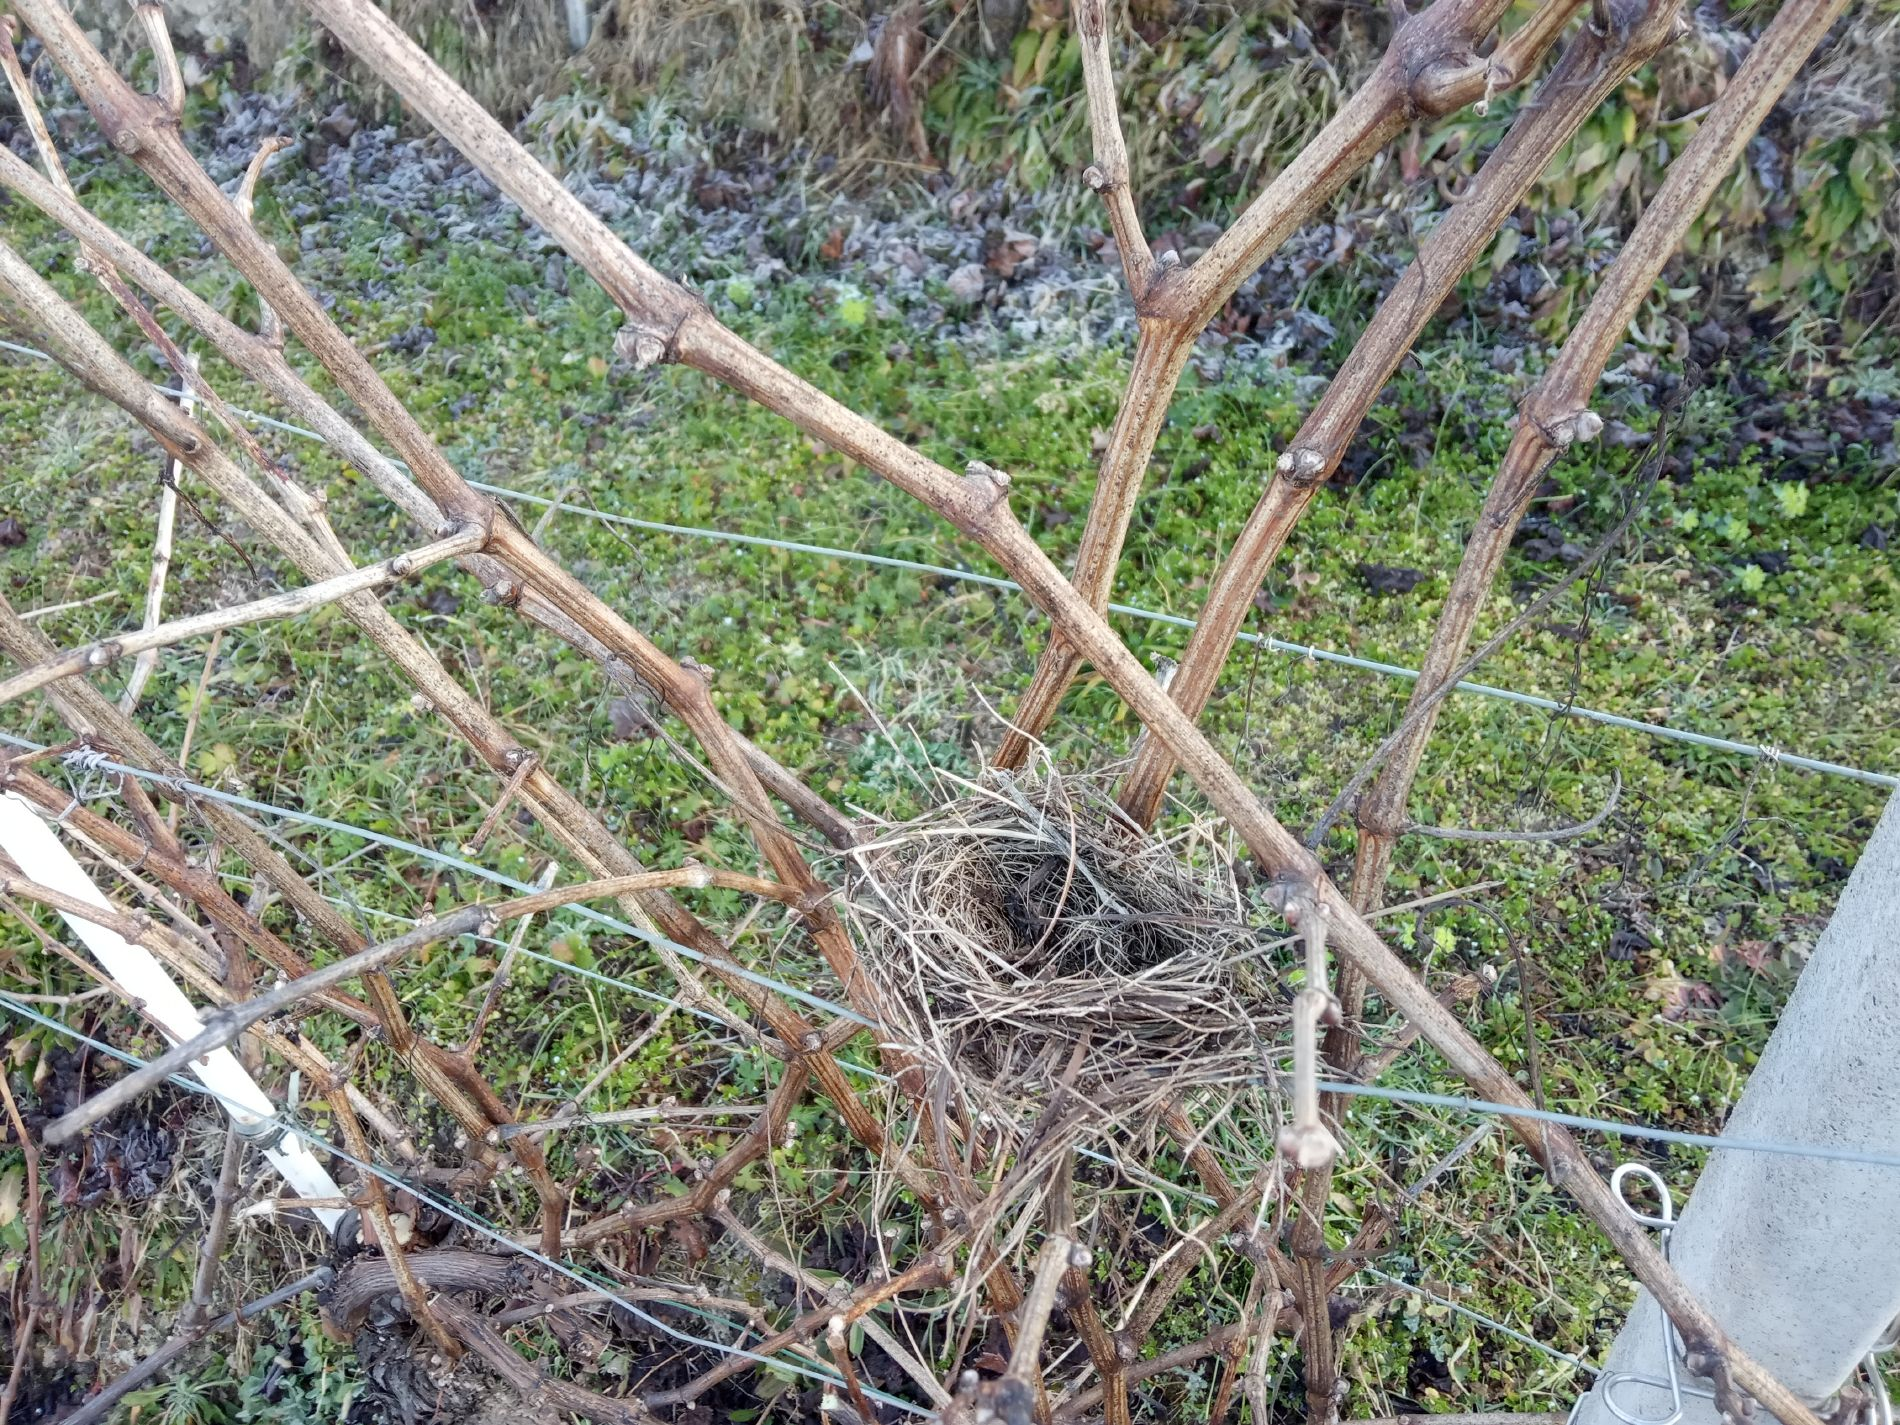 Barovero nido vigna